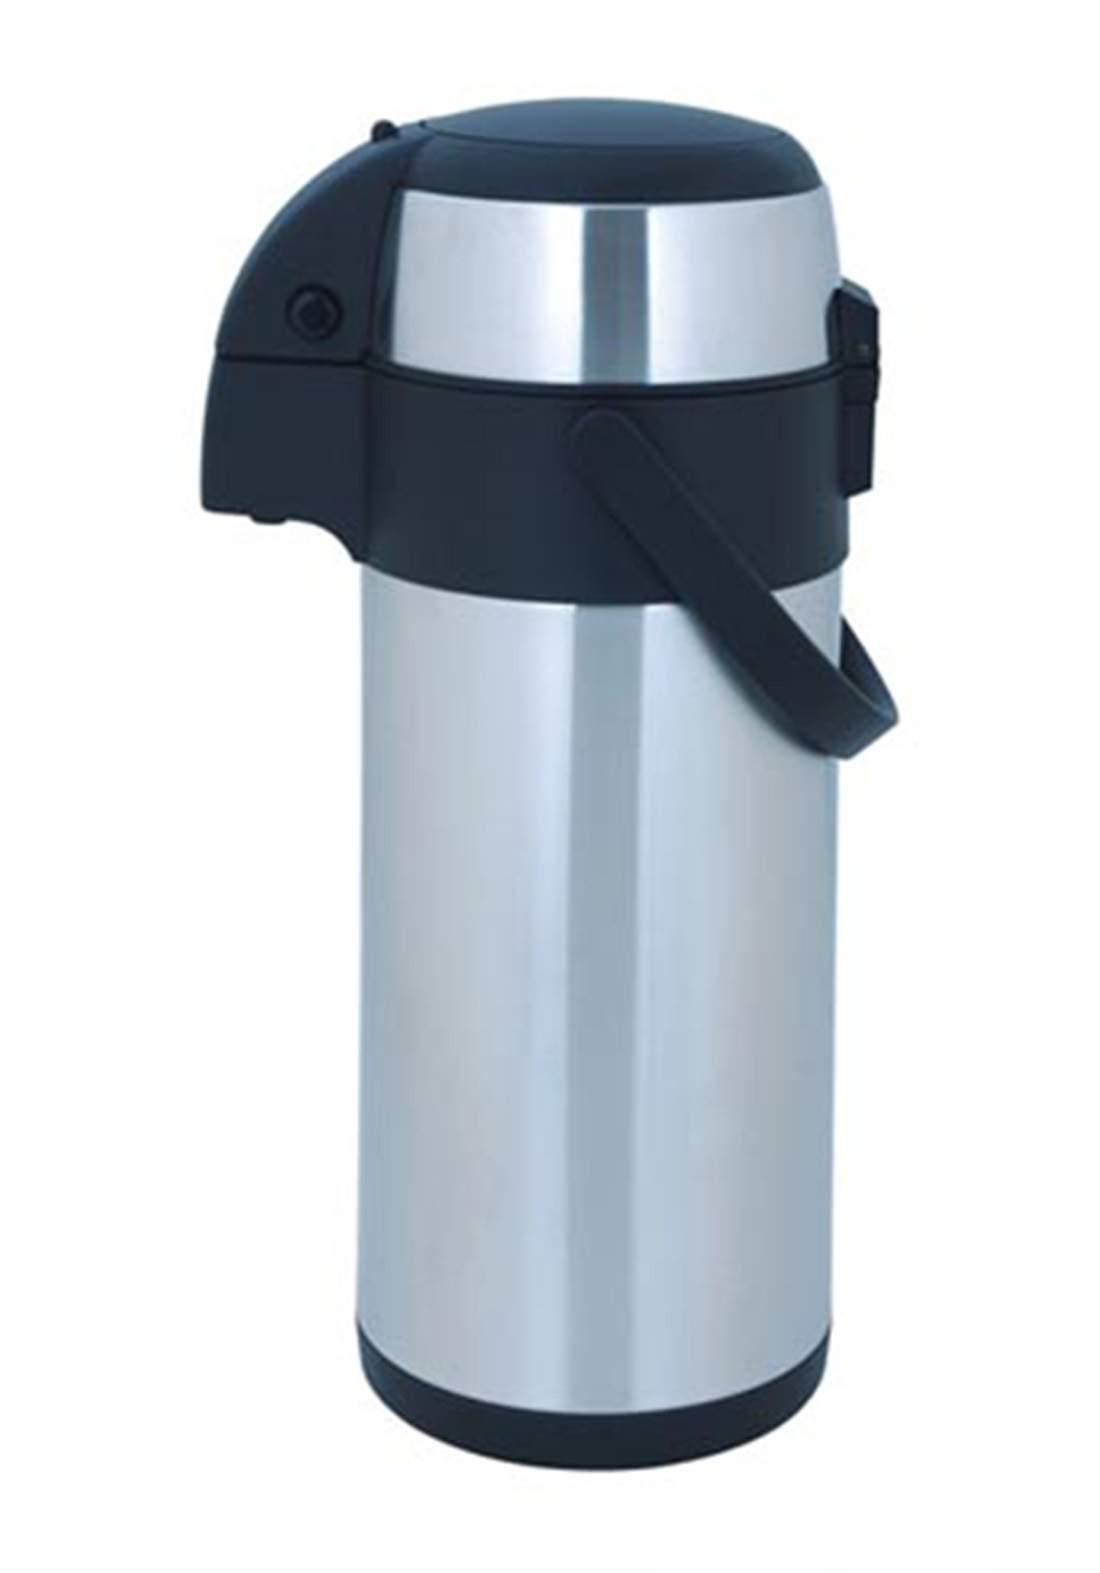 Delmonti DL1680 Flask   Vacuun 3L  ترمز حراري